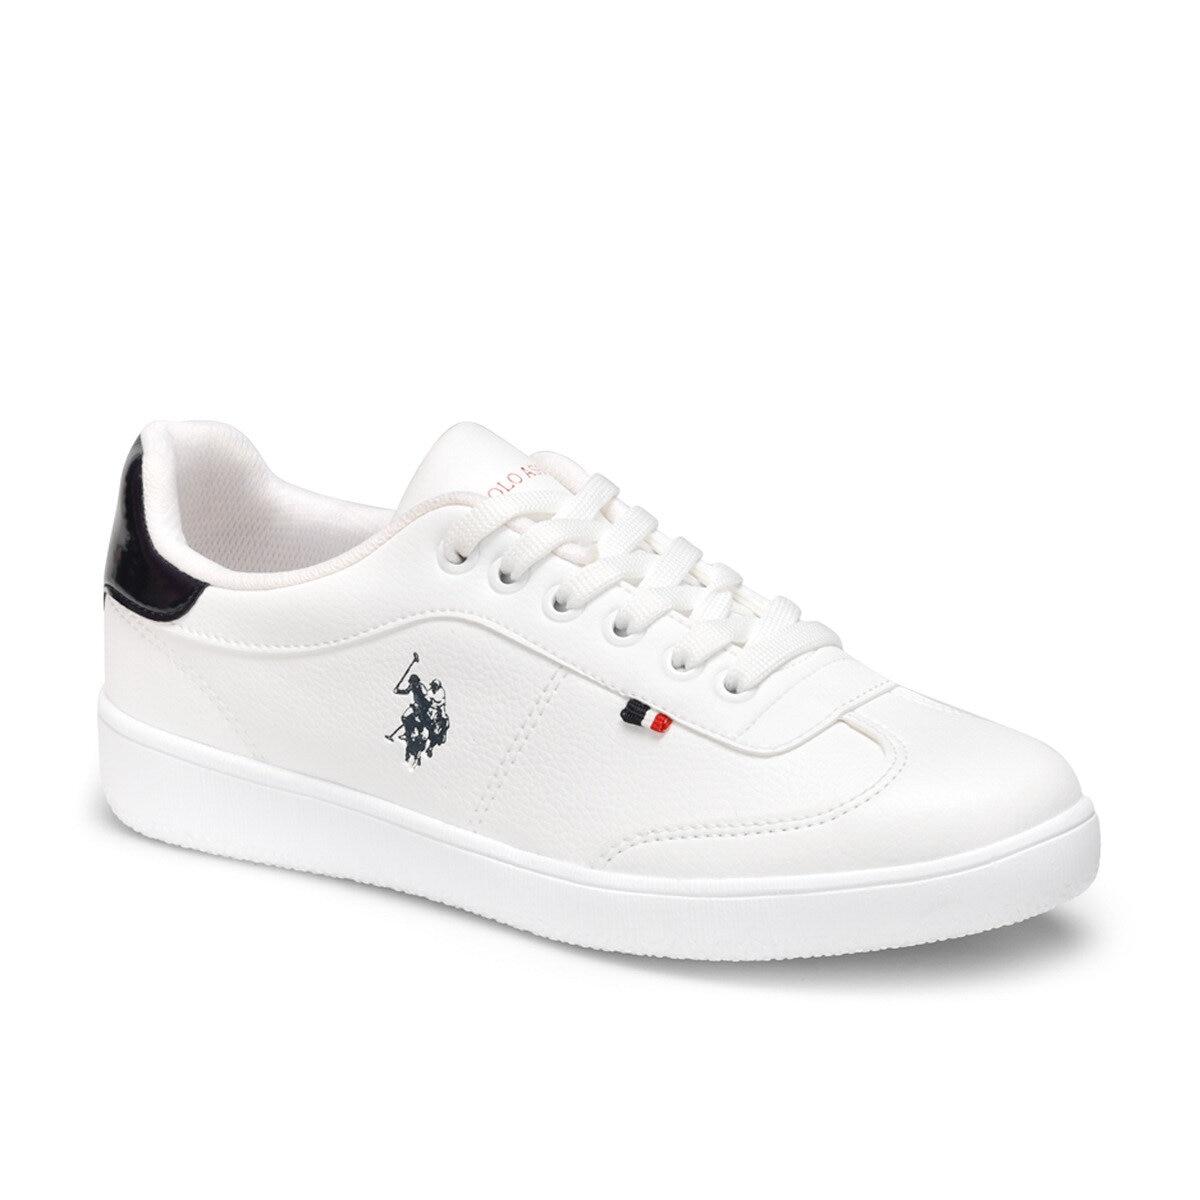 FLO SOMMER Navy Blue Women 'S Sneaker Shoes U.S. POLO ASSN.